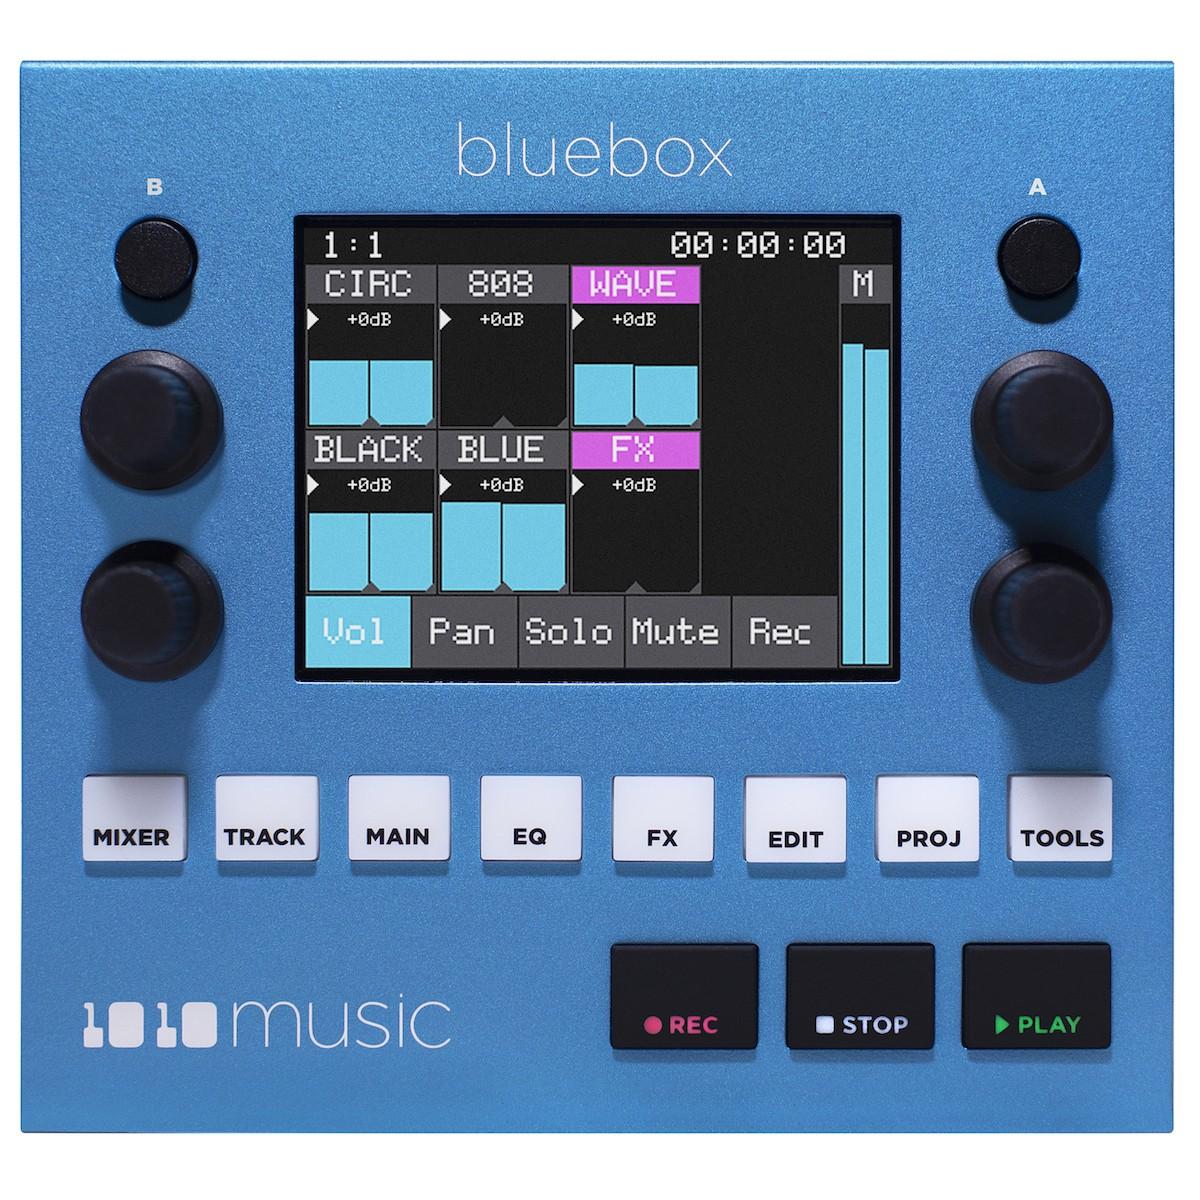 1010Music_BlueBox_01.jpg